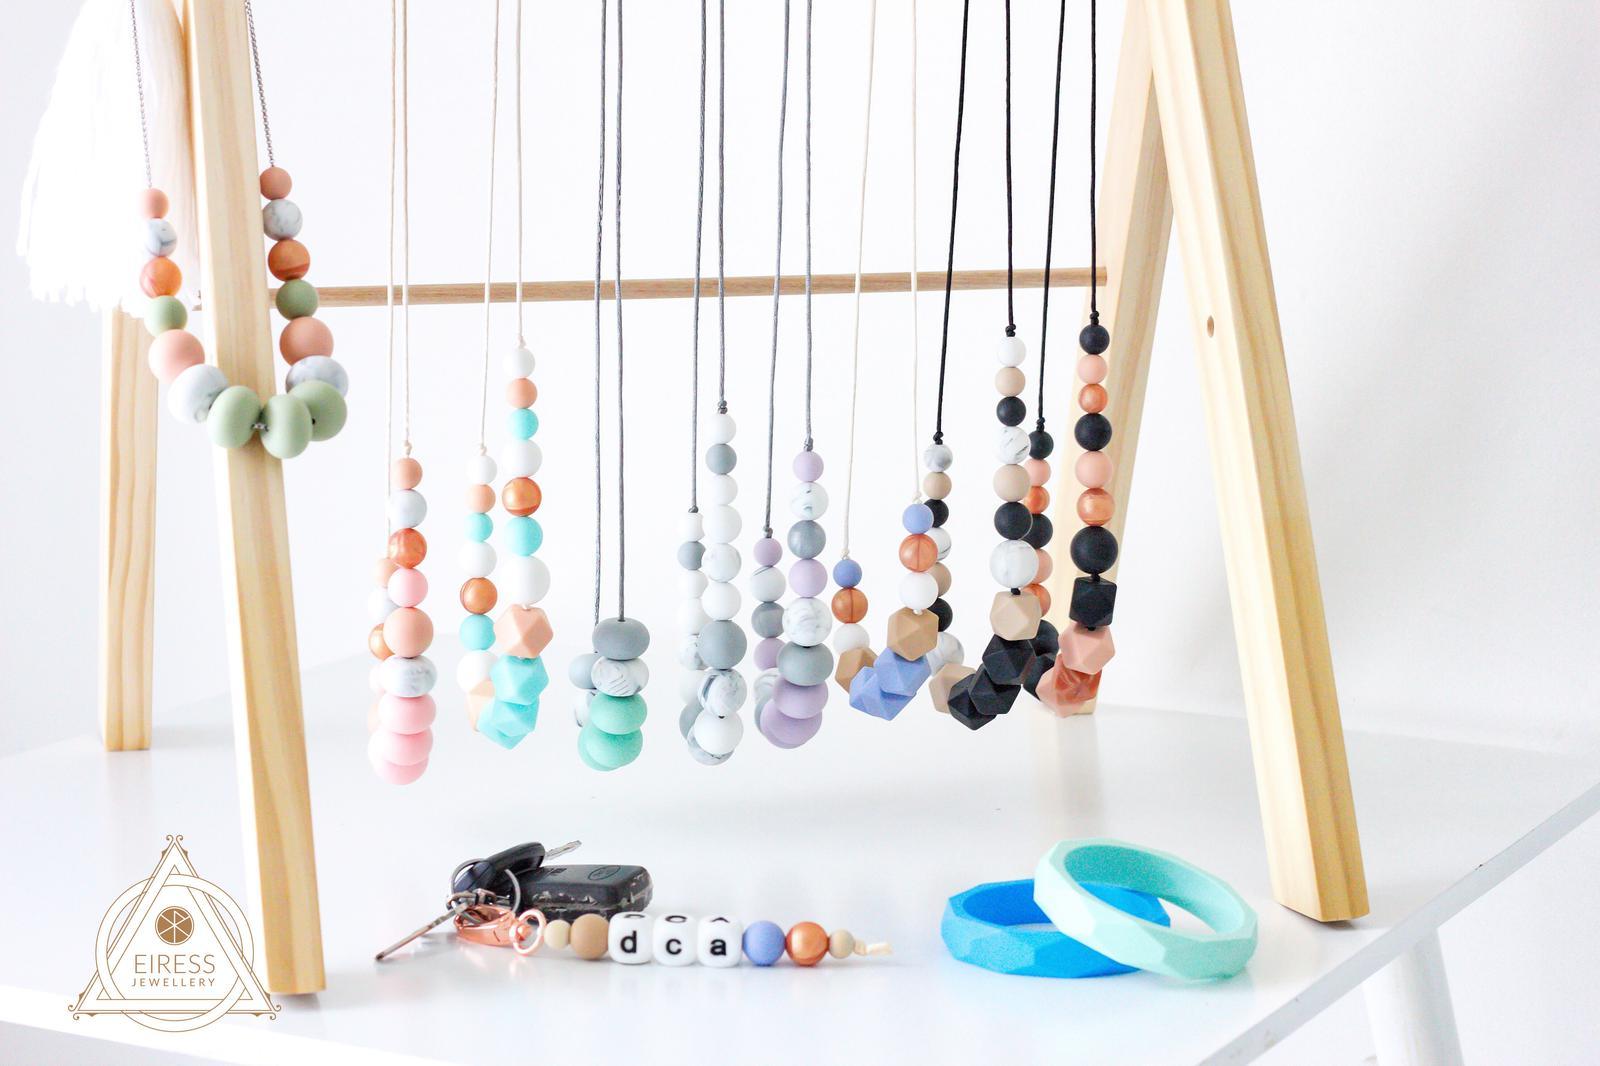 Eiress Necklaces